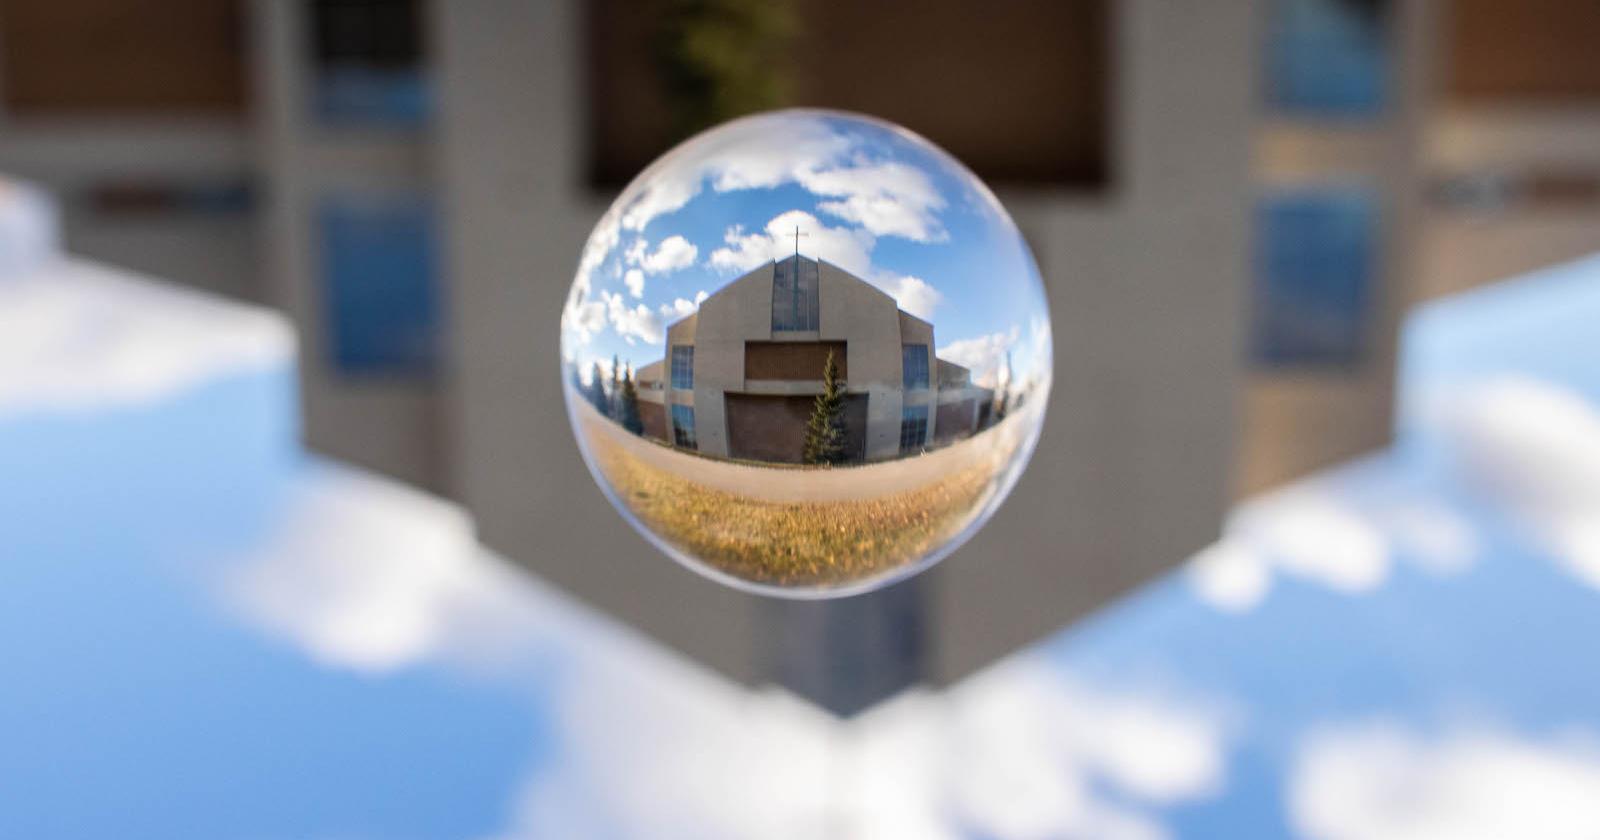 Lens ball photo